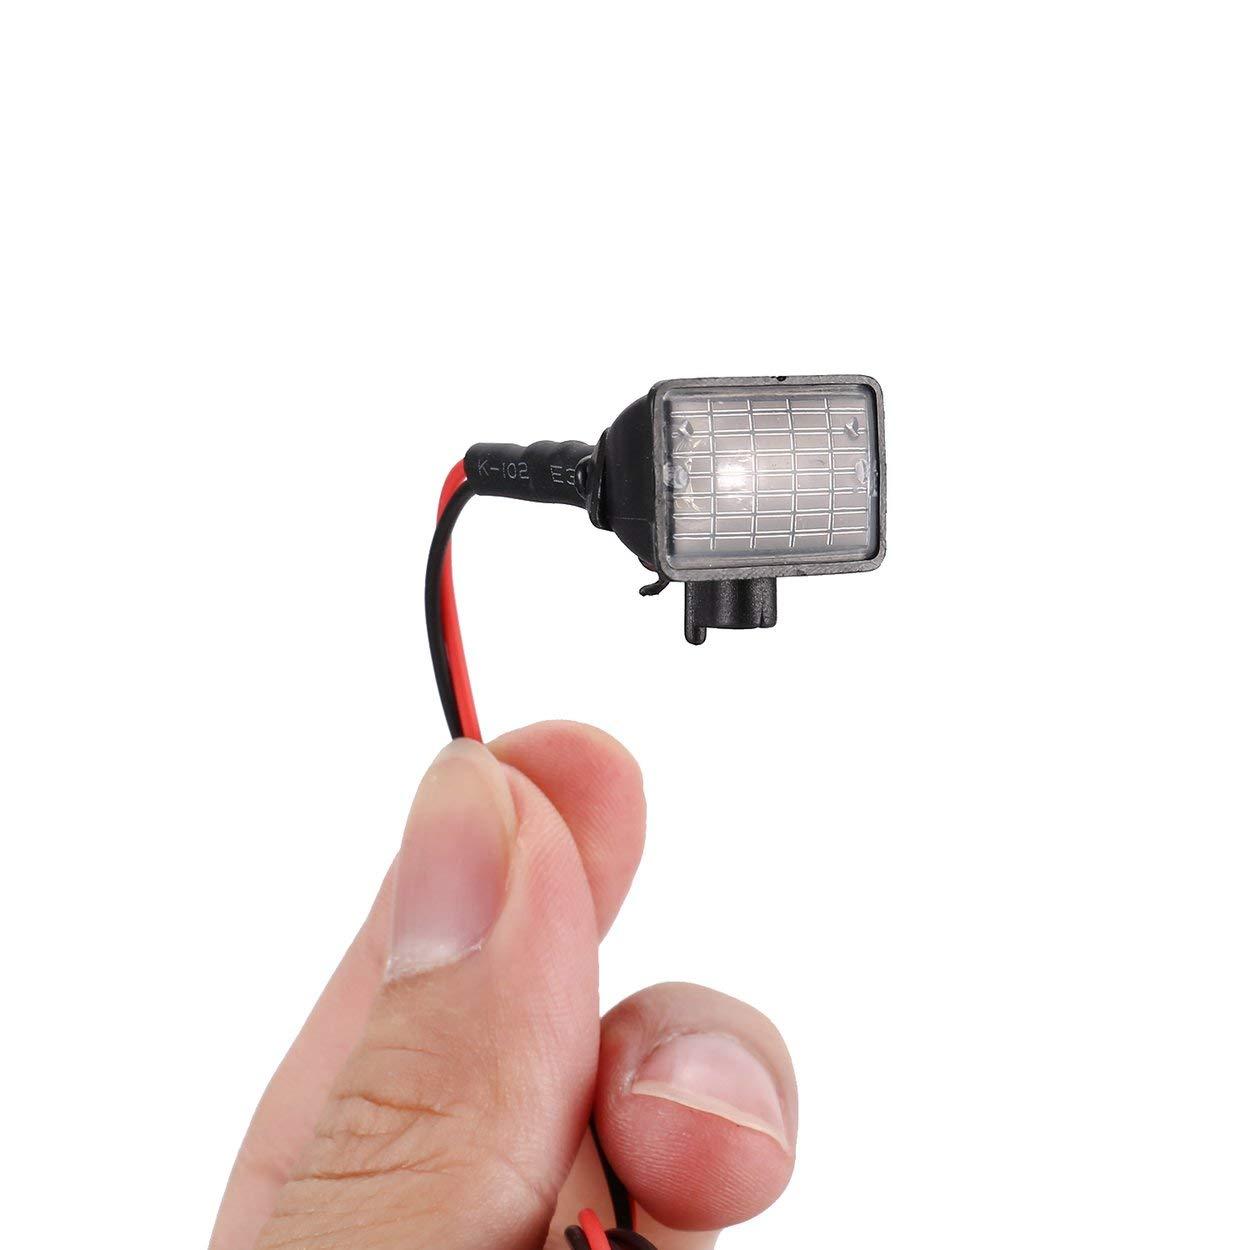 Lorenlli 4 unids RC Coche Multi Funci/ón Cuadrada L/ámpara de Luz LED con Pantalla para RC Coche 1//10 SCX10 D90 TRX4 Modelo Crawler Car